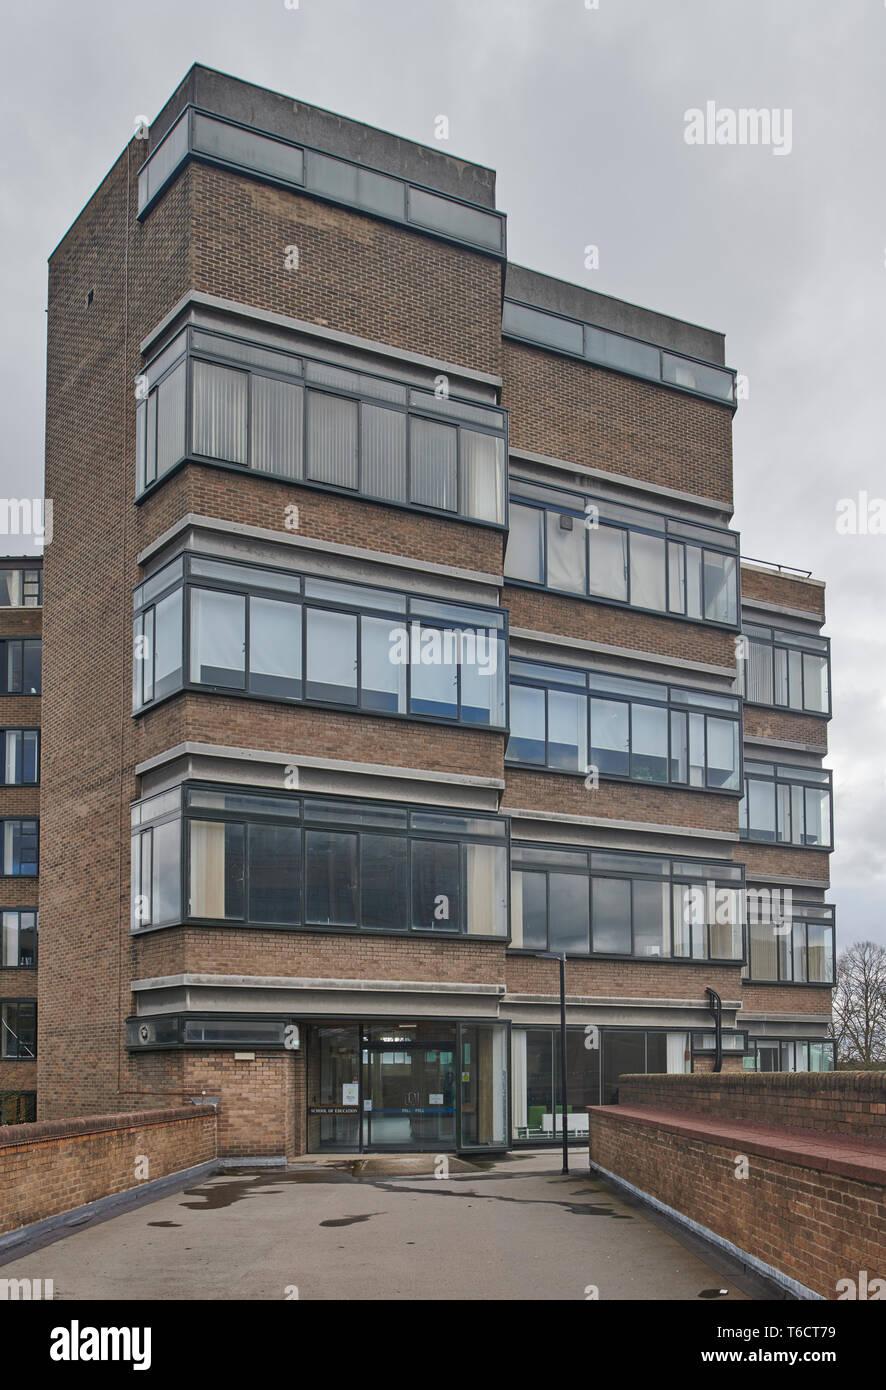 School of Education, Birmingham University, Birmingham UK - Stock Image